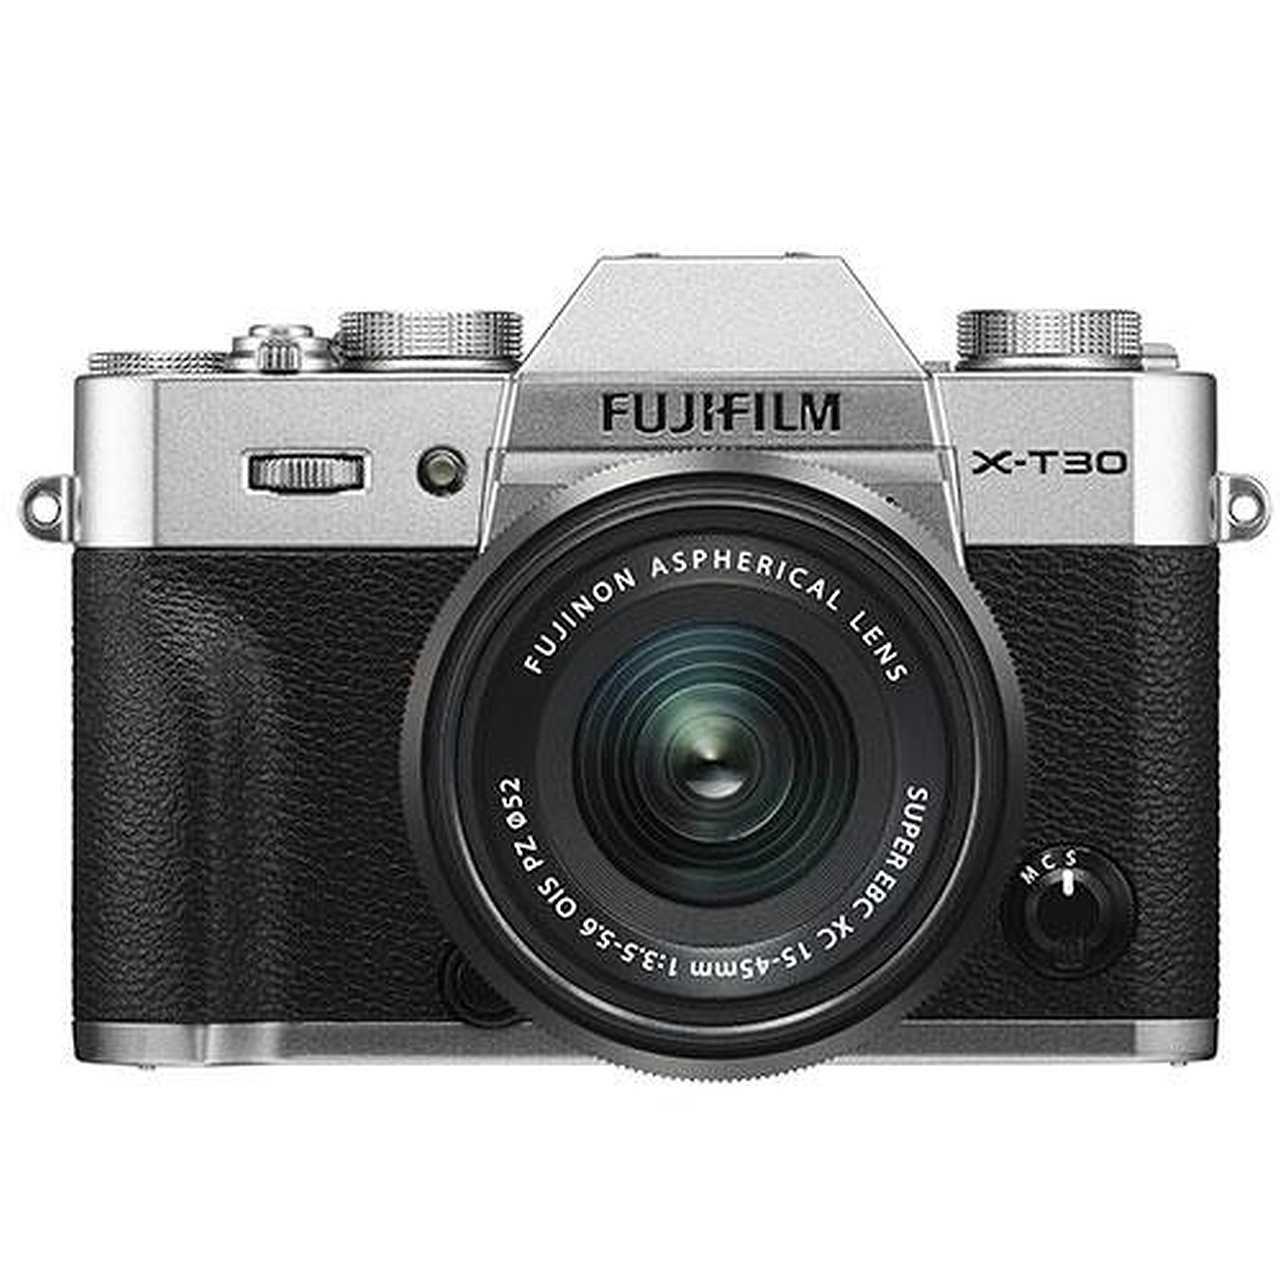 Fujifilm X-T30 front view